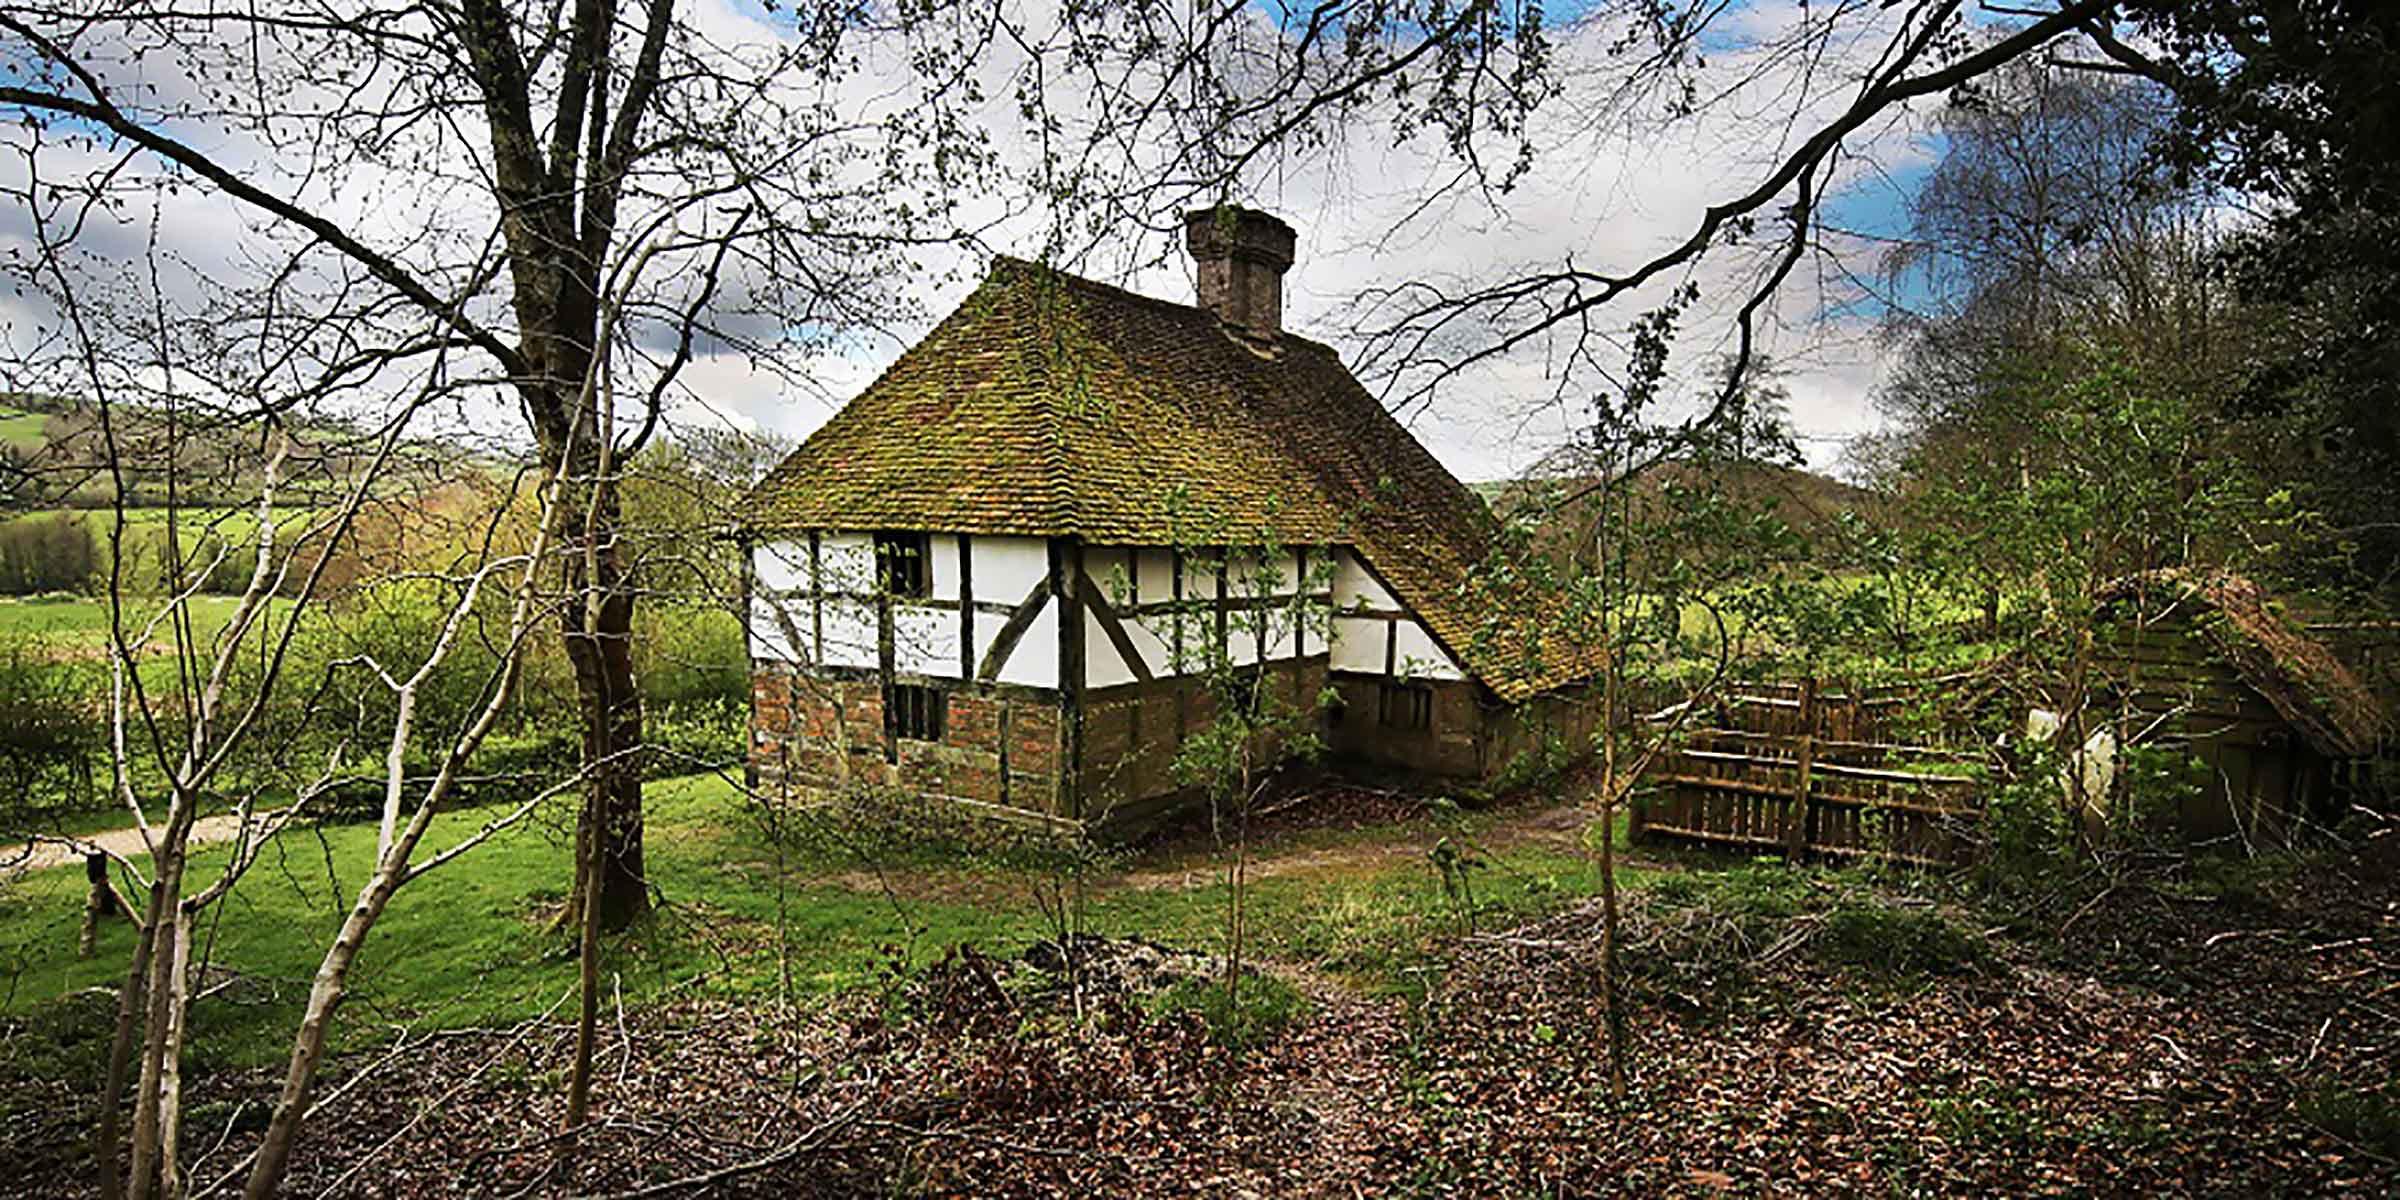 Pendean Farmhouse from Midhurst